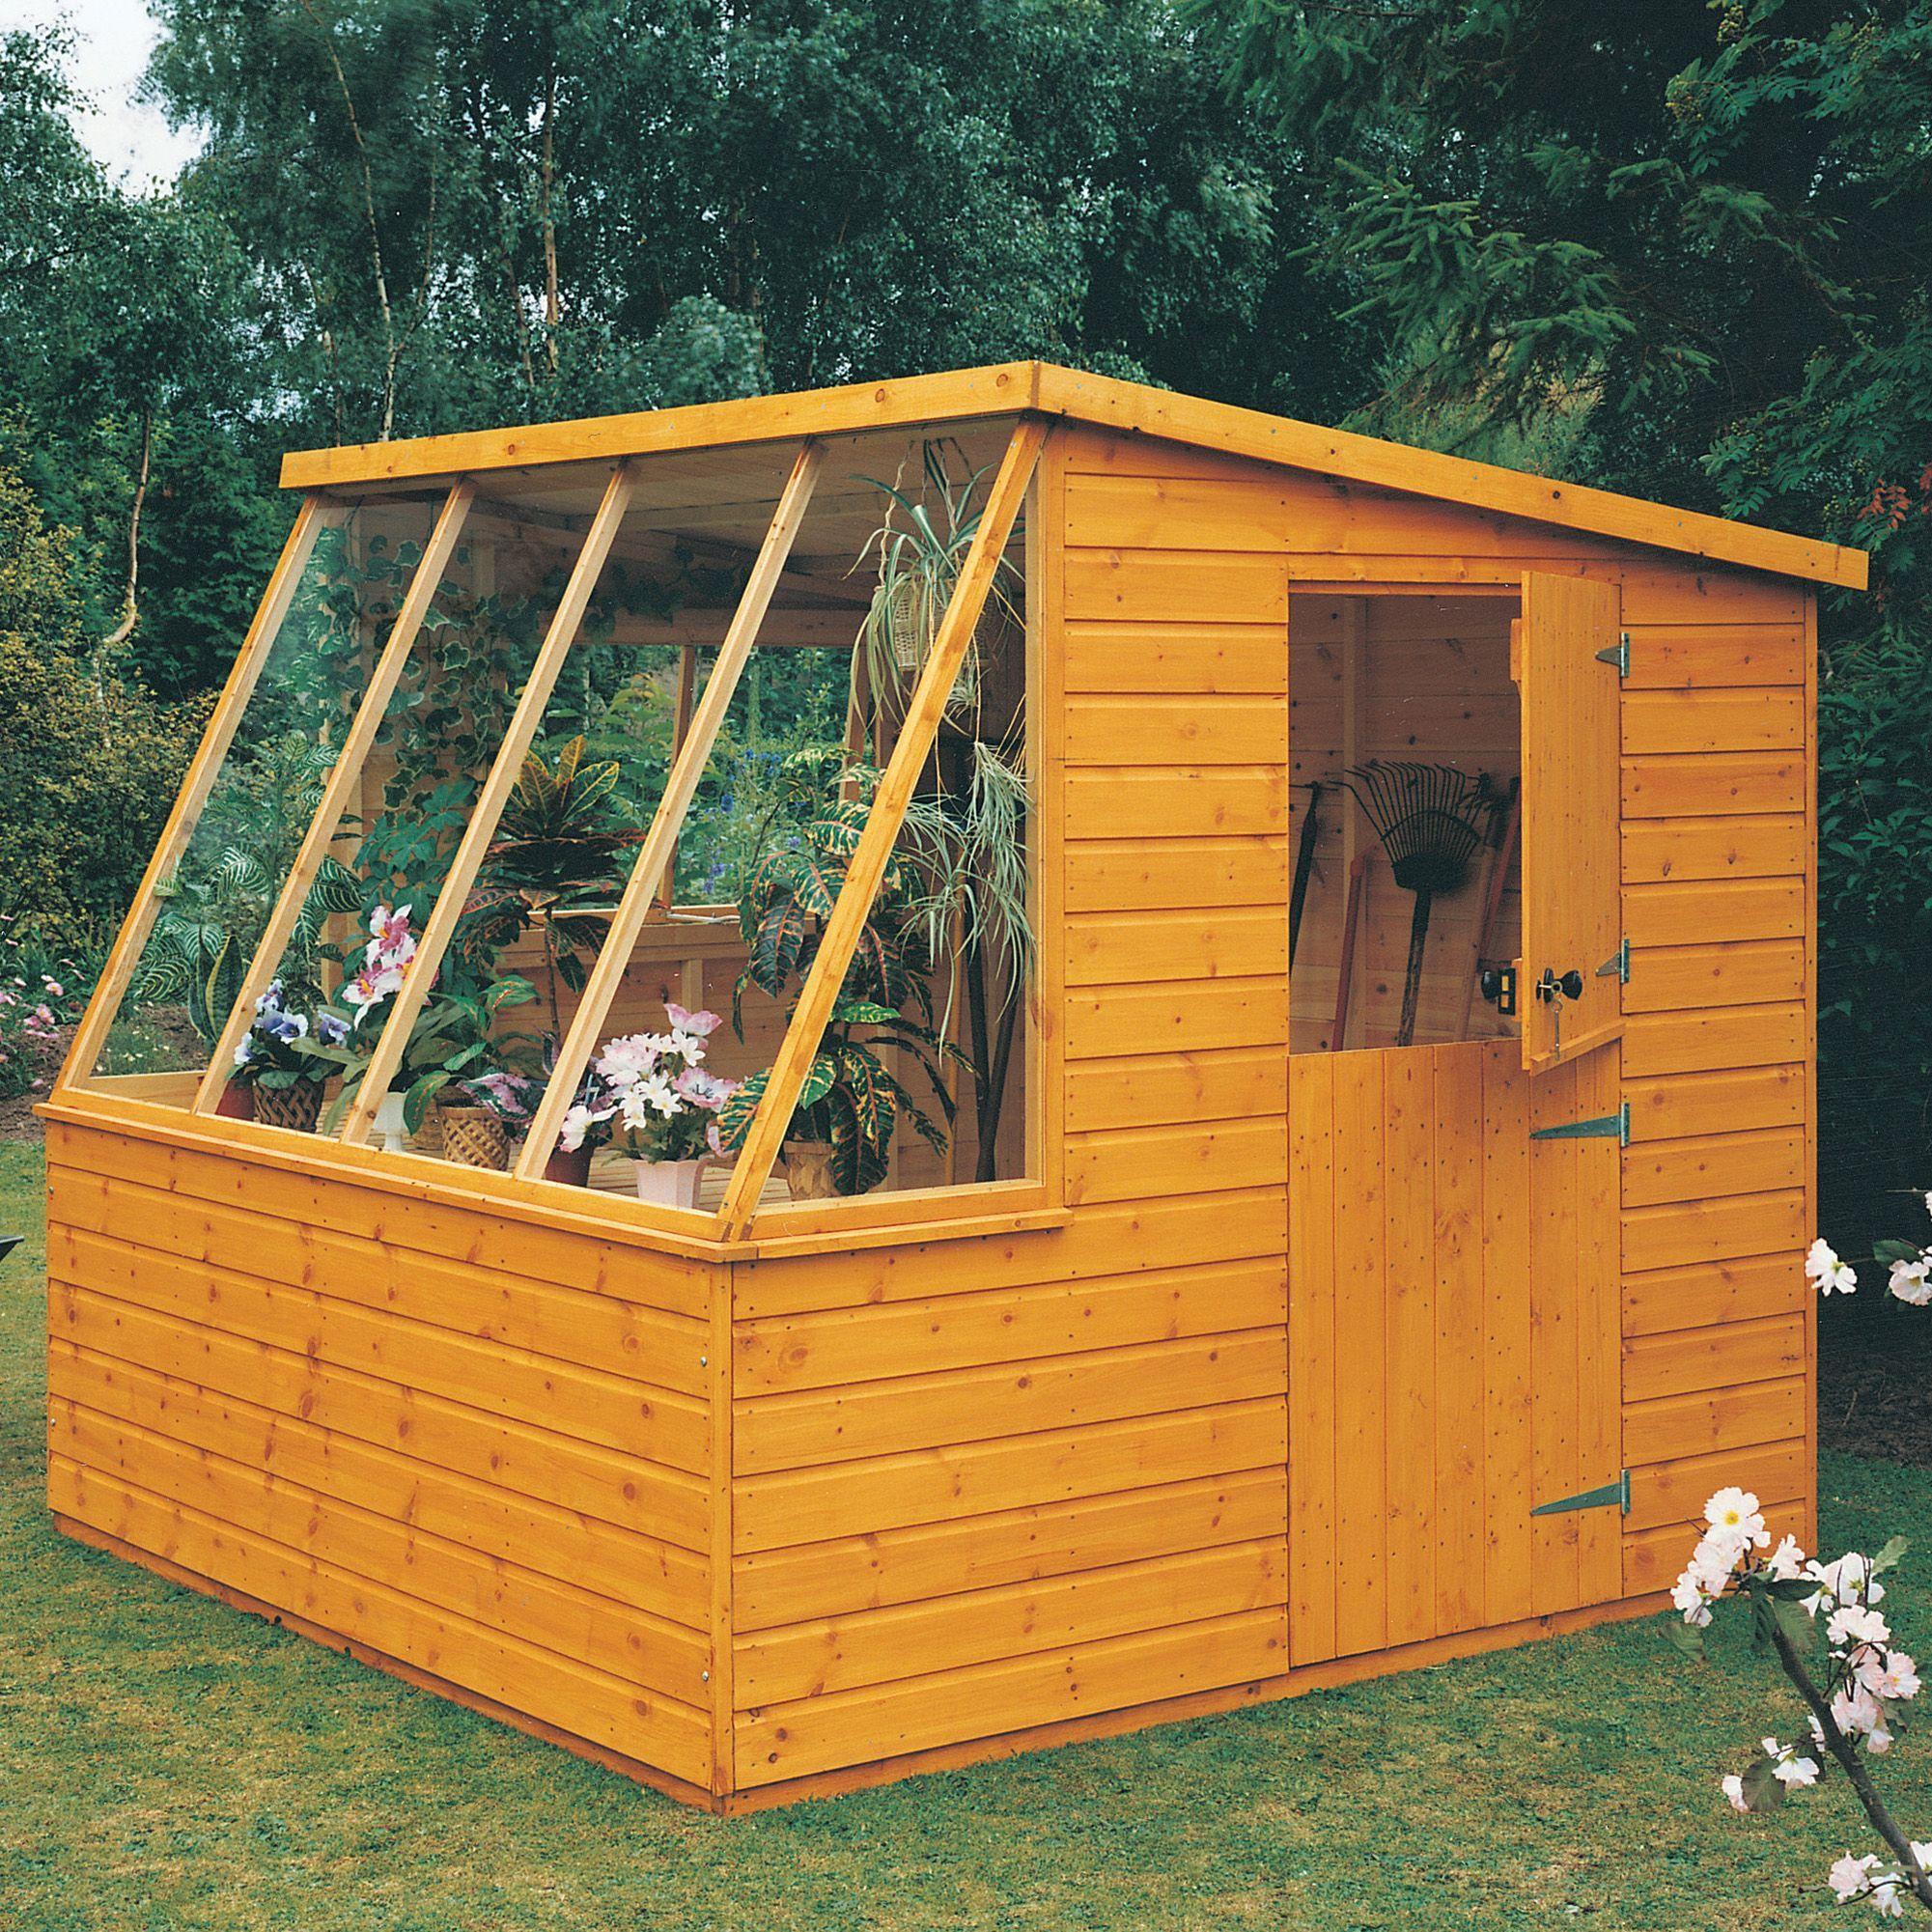 plans amp d be building qu sheds o fun home shed portable enjoyable should a hlon for